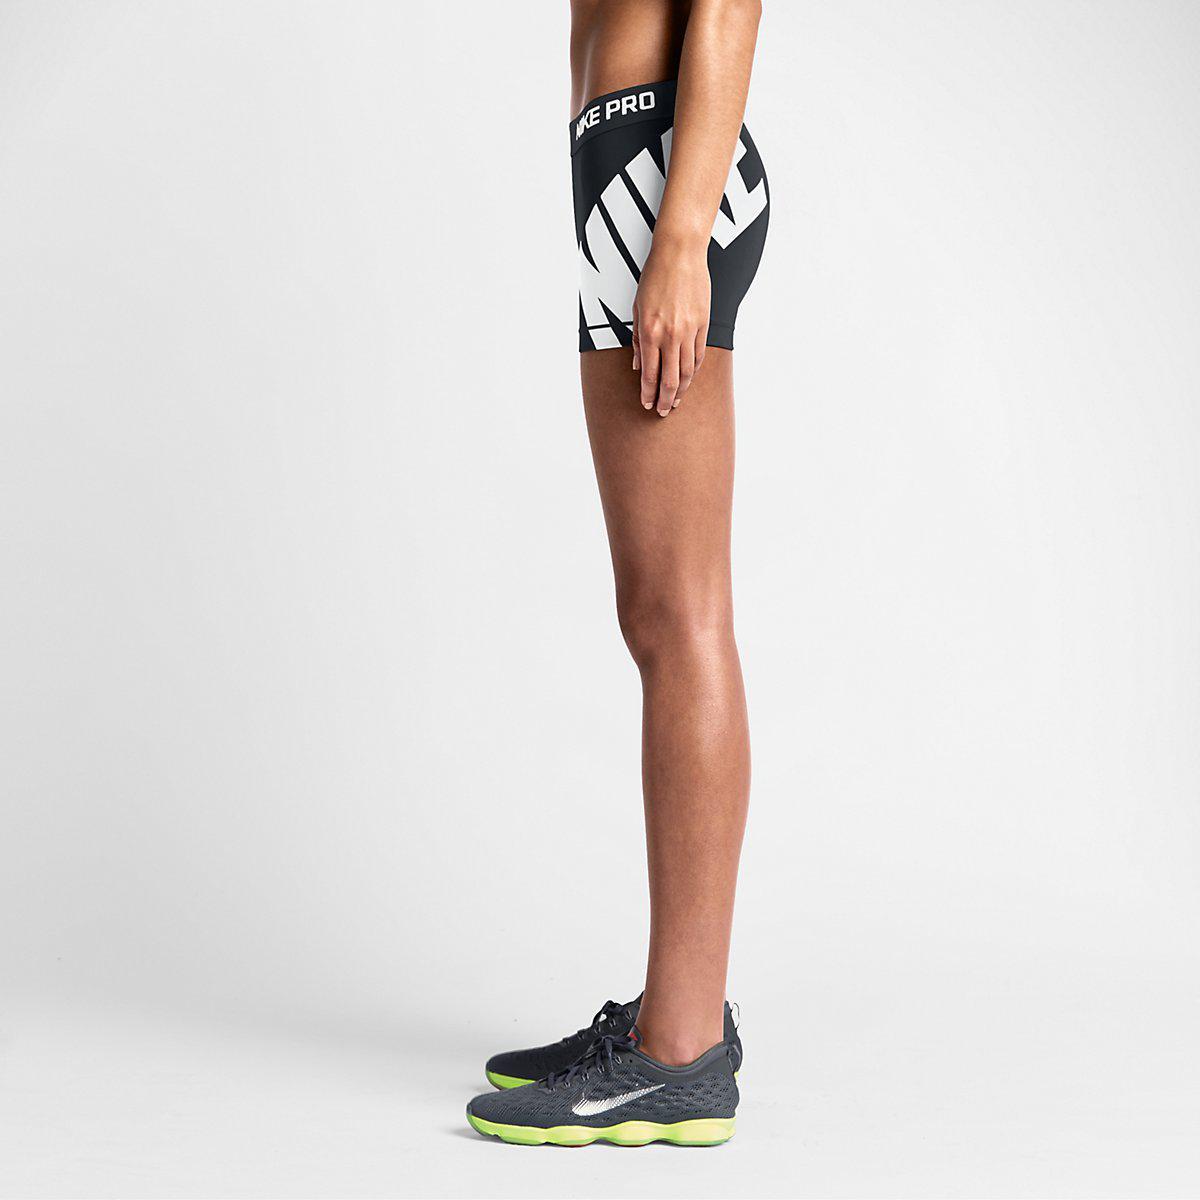 08900ae0ad345 Nike Womens Pro 3